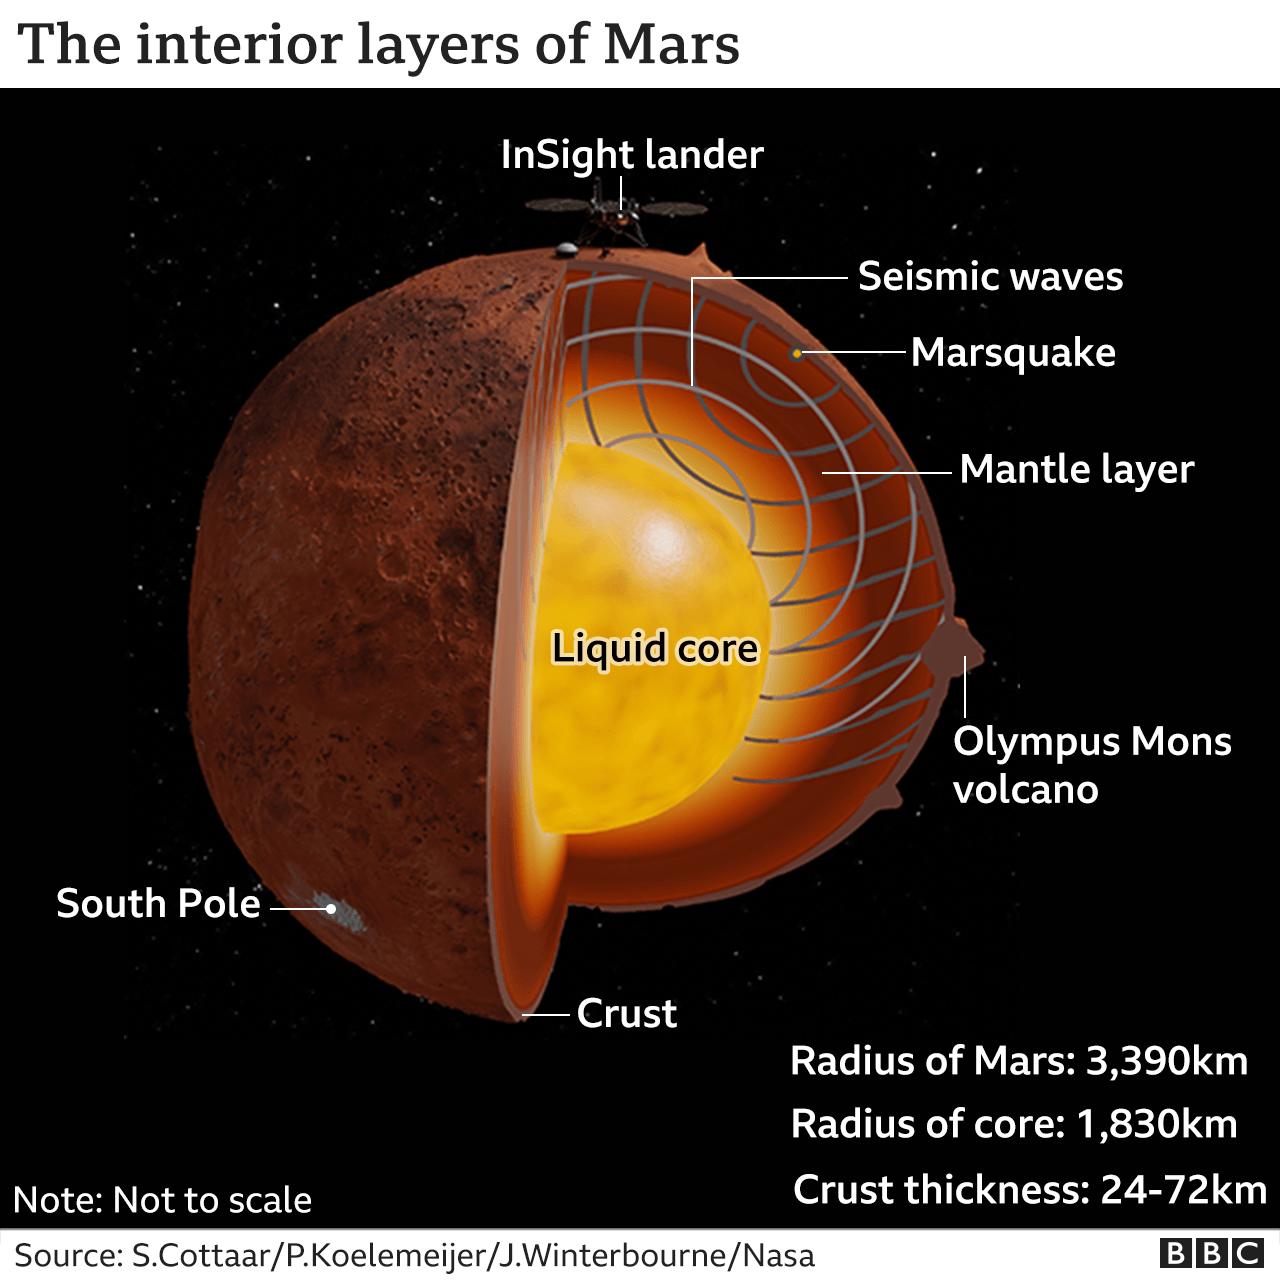 Mars' interior